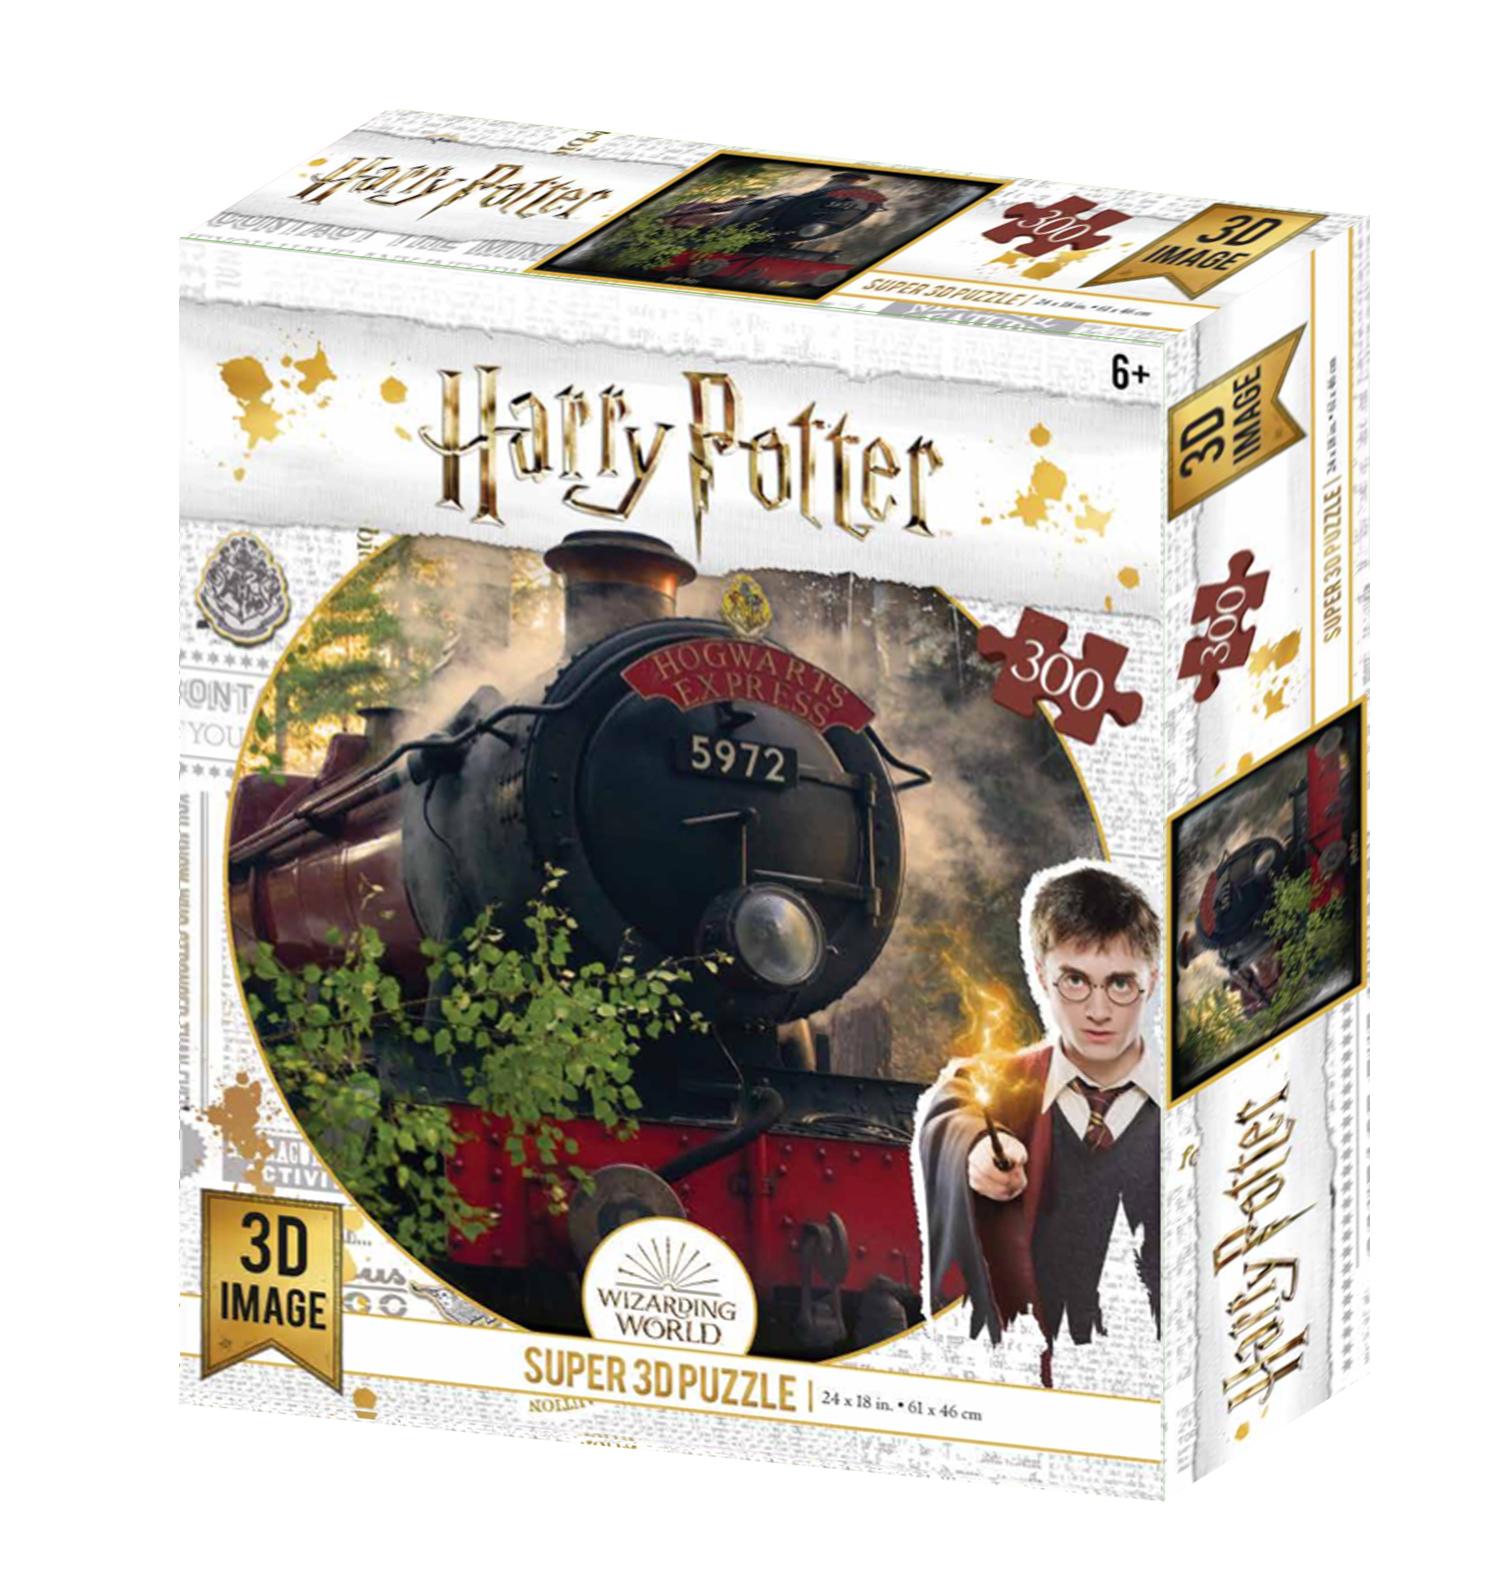 Super 3D: 300-Piece Jigsaw Puzzle - Harry Potter: The Hogwarts Express image